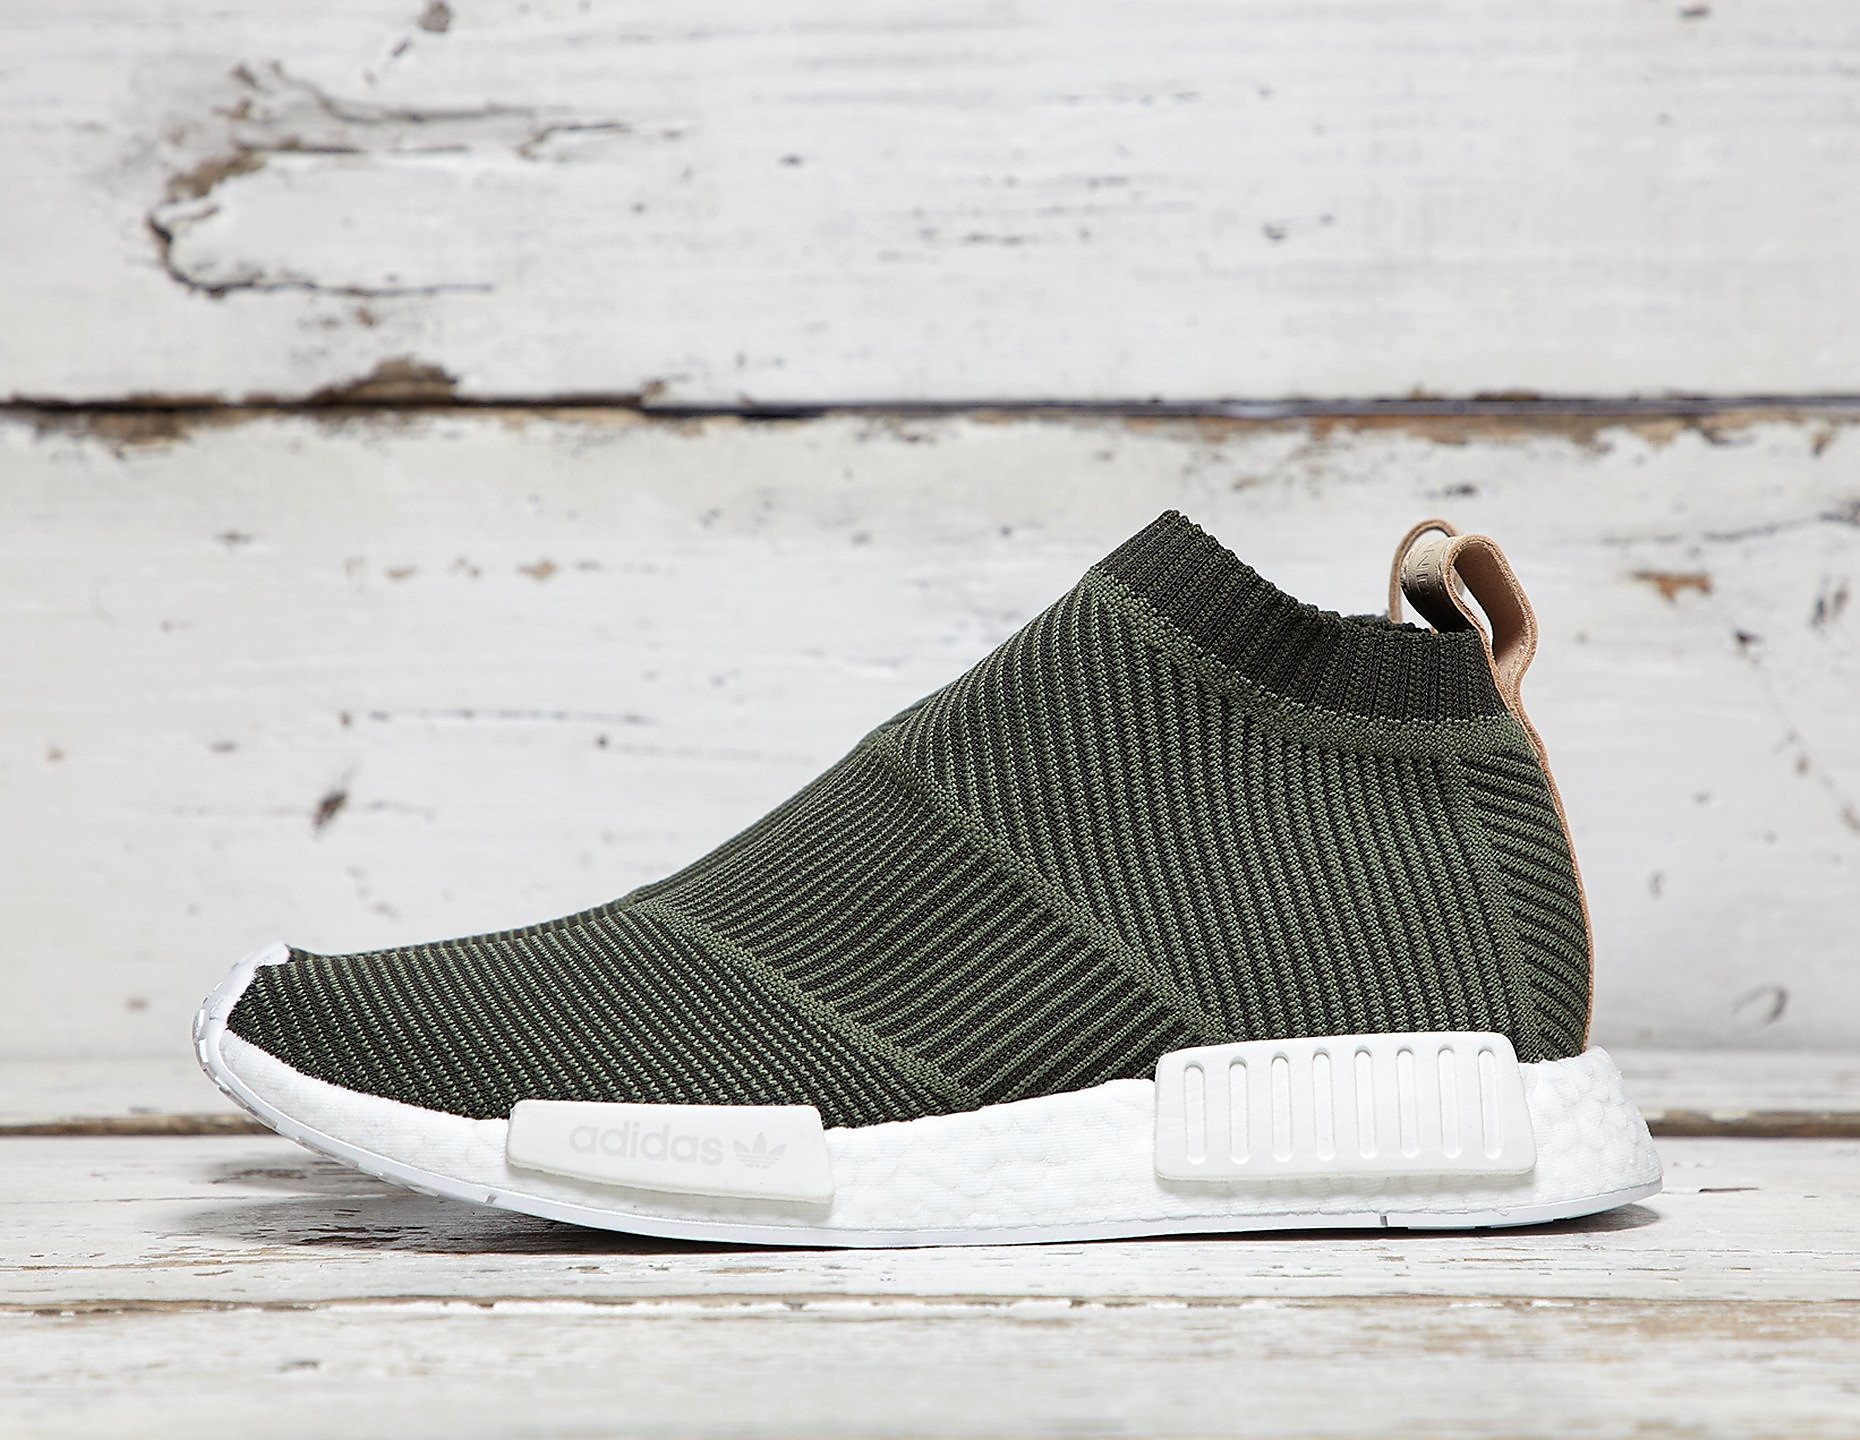 Adidas Originals calzado NMD footpatrol NMD calzado 815cd8